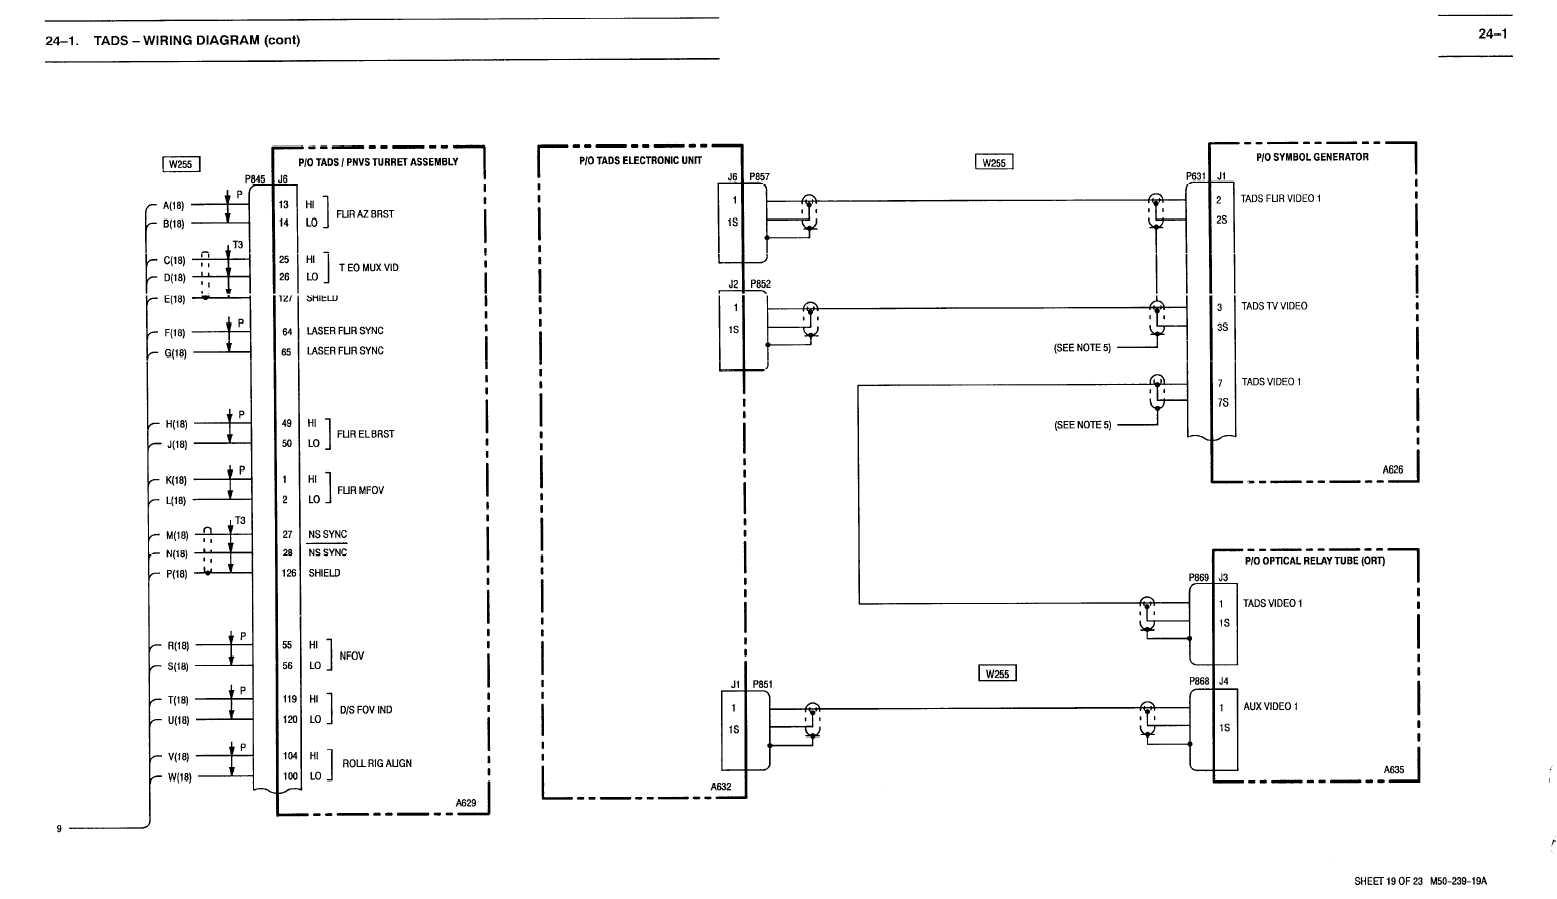 24 1 tads wiring diagram cont tm 1 1520 238 t 10 587. Black Bedroom Furniture Sets. Home Design Ideas